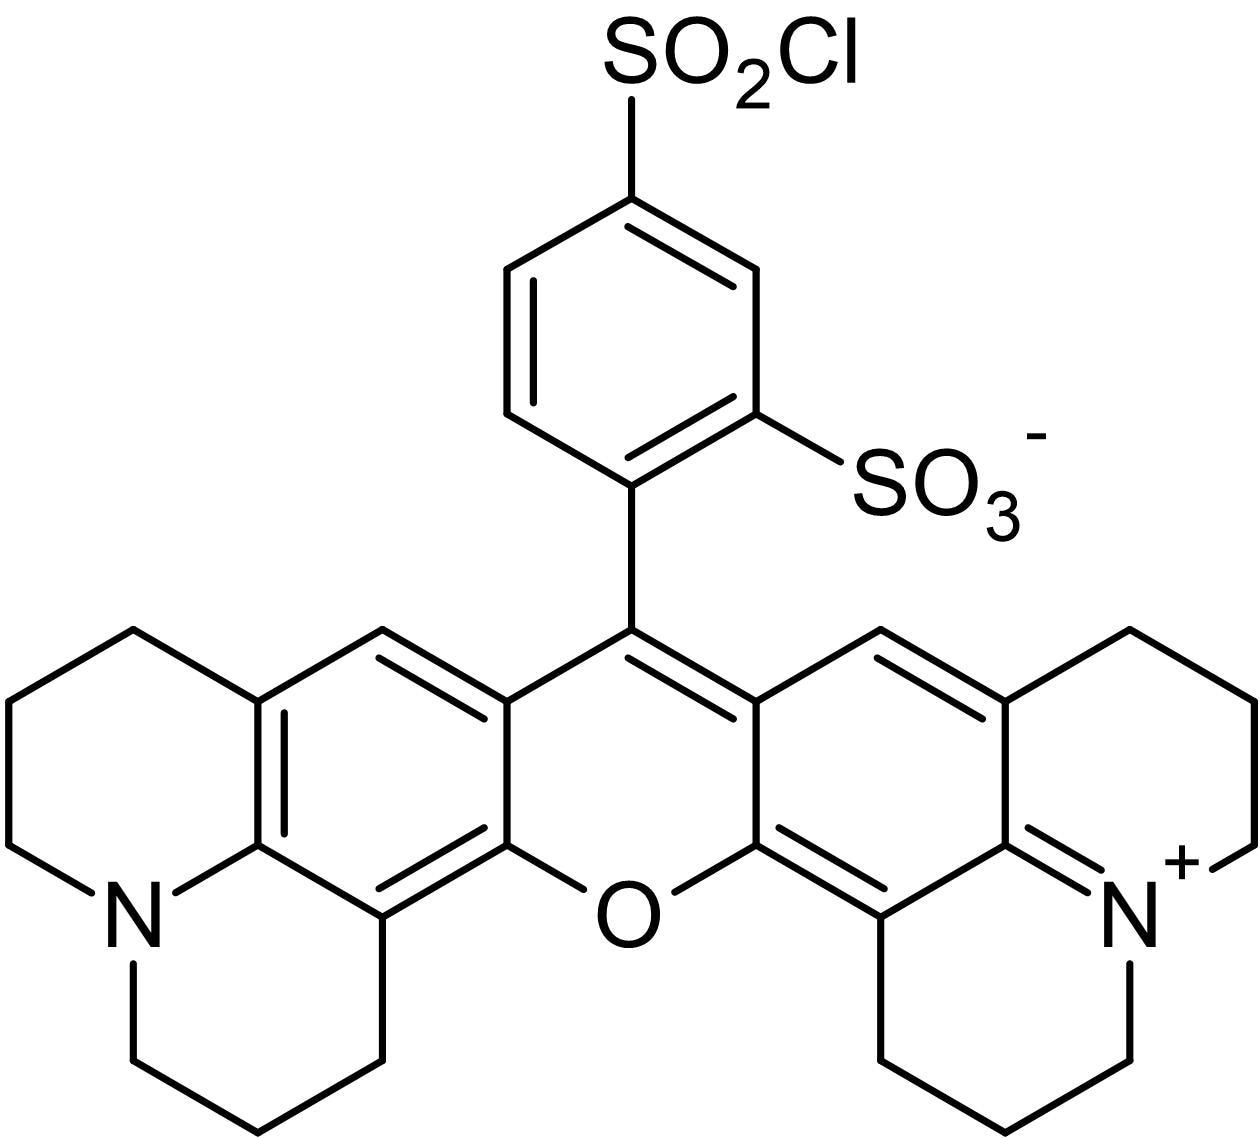 Chemical Structure - Sulforhodamine 101 acid chloride, amine-reactive rhodamine dye (ab145302)